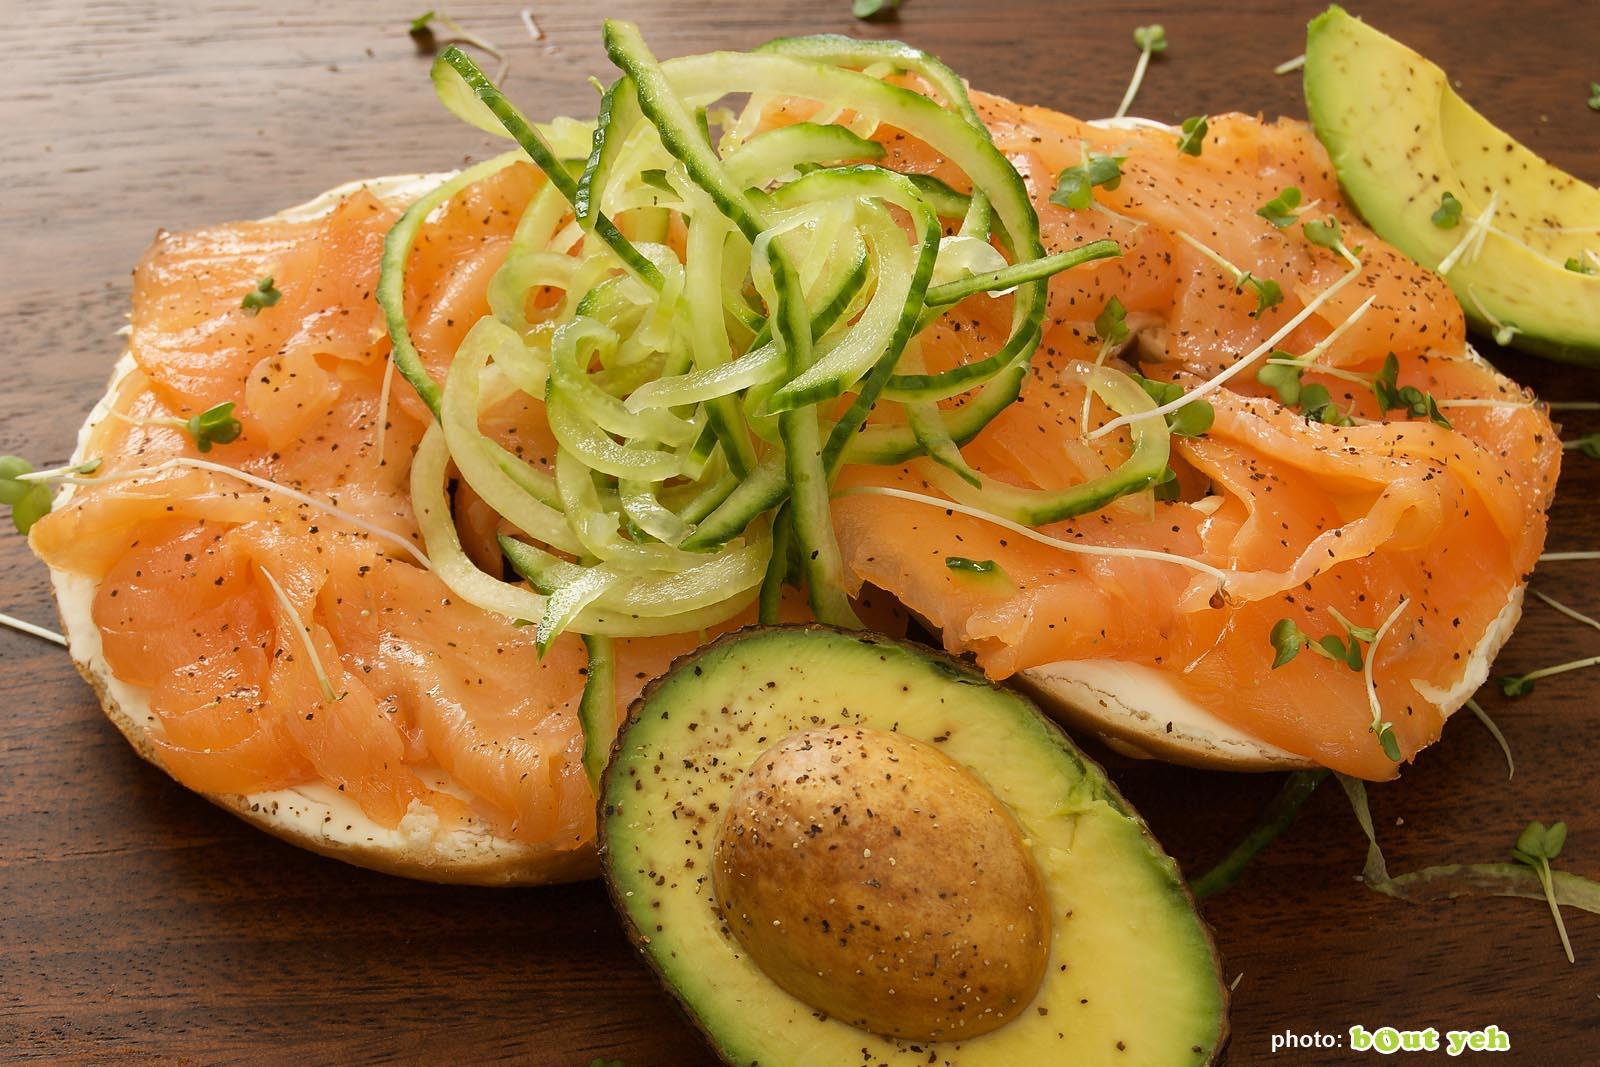 Food photographers Belfast portfolio photo 1305 - smoked salmon and avocado bagel